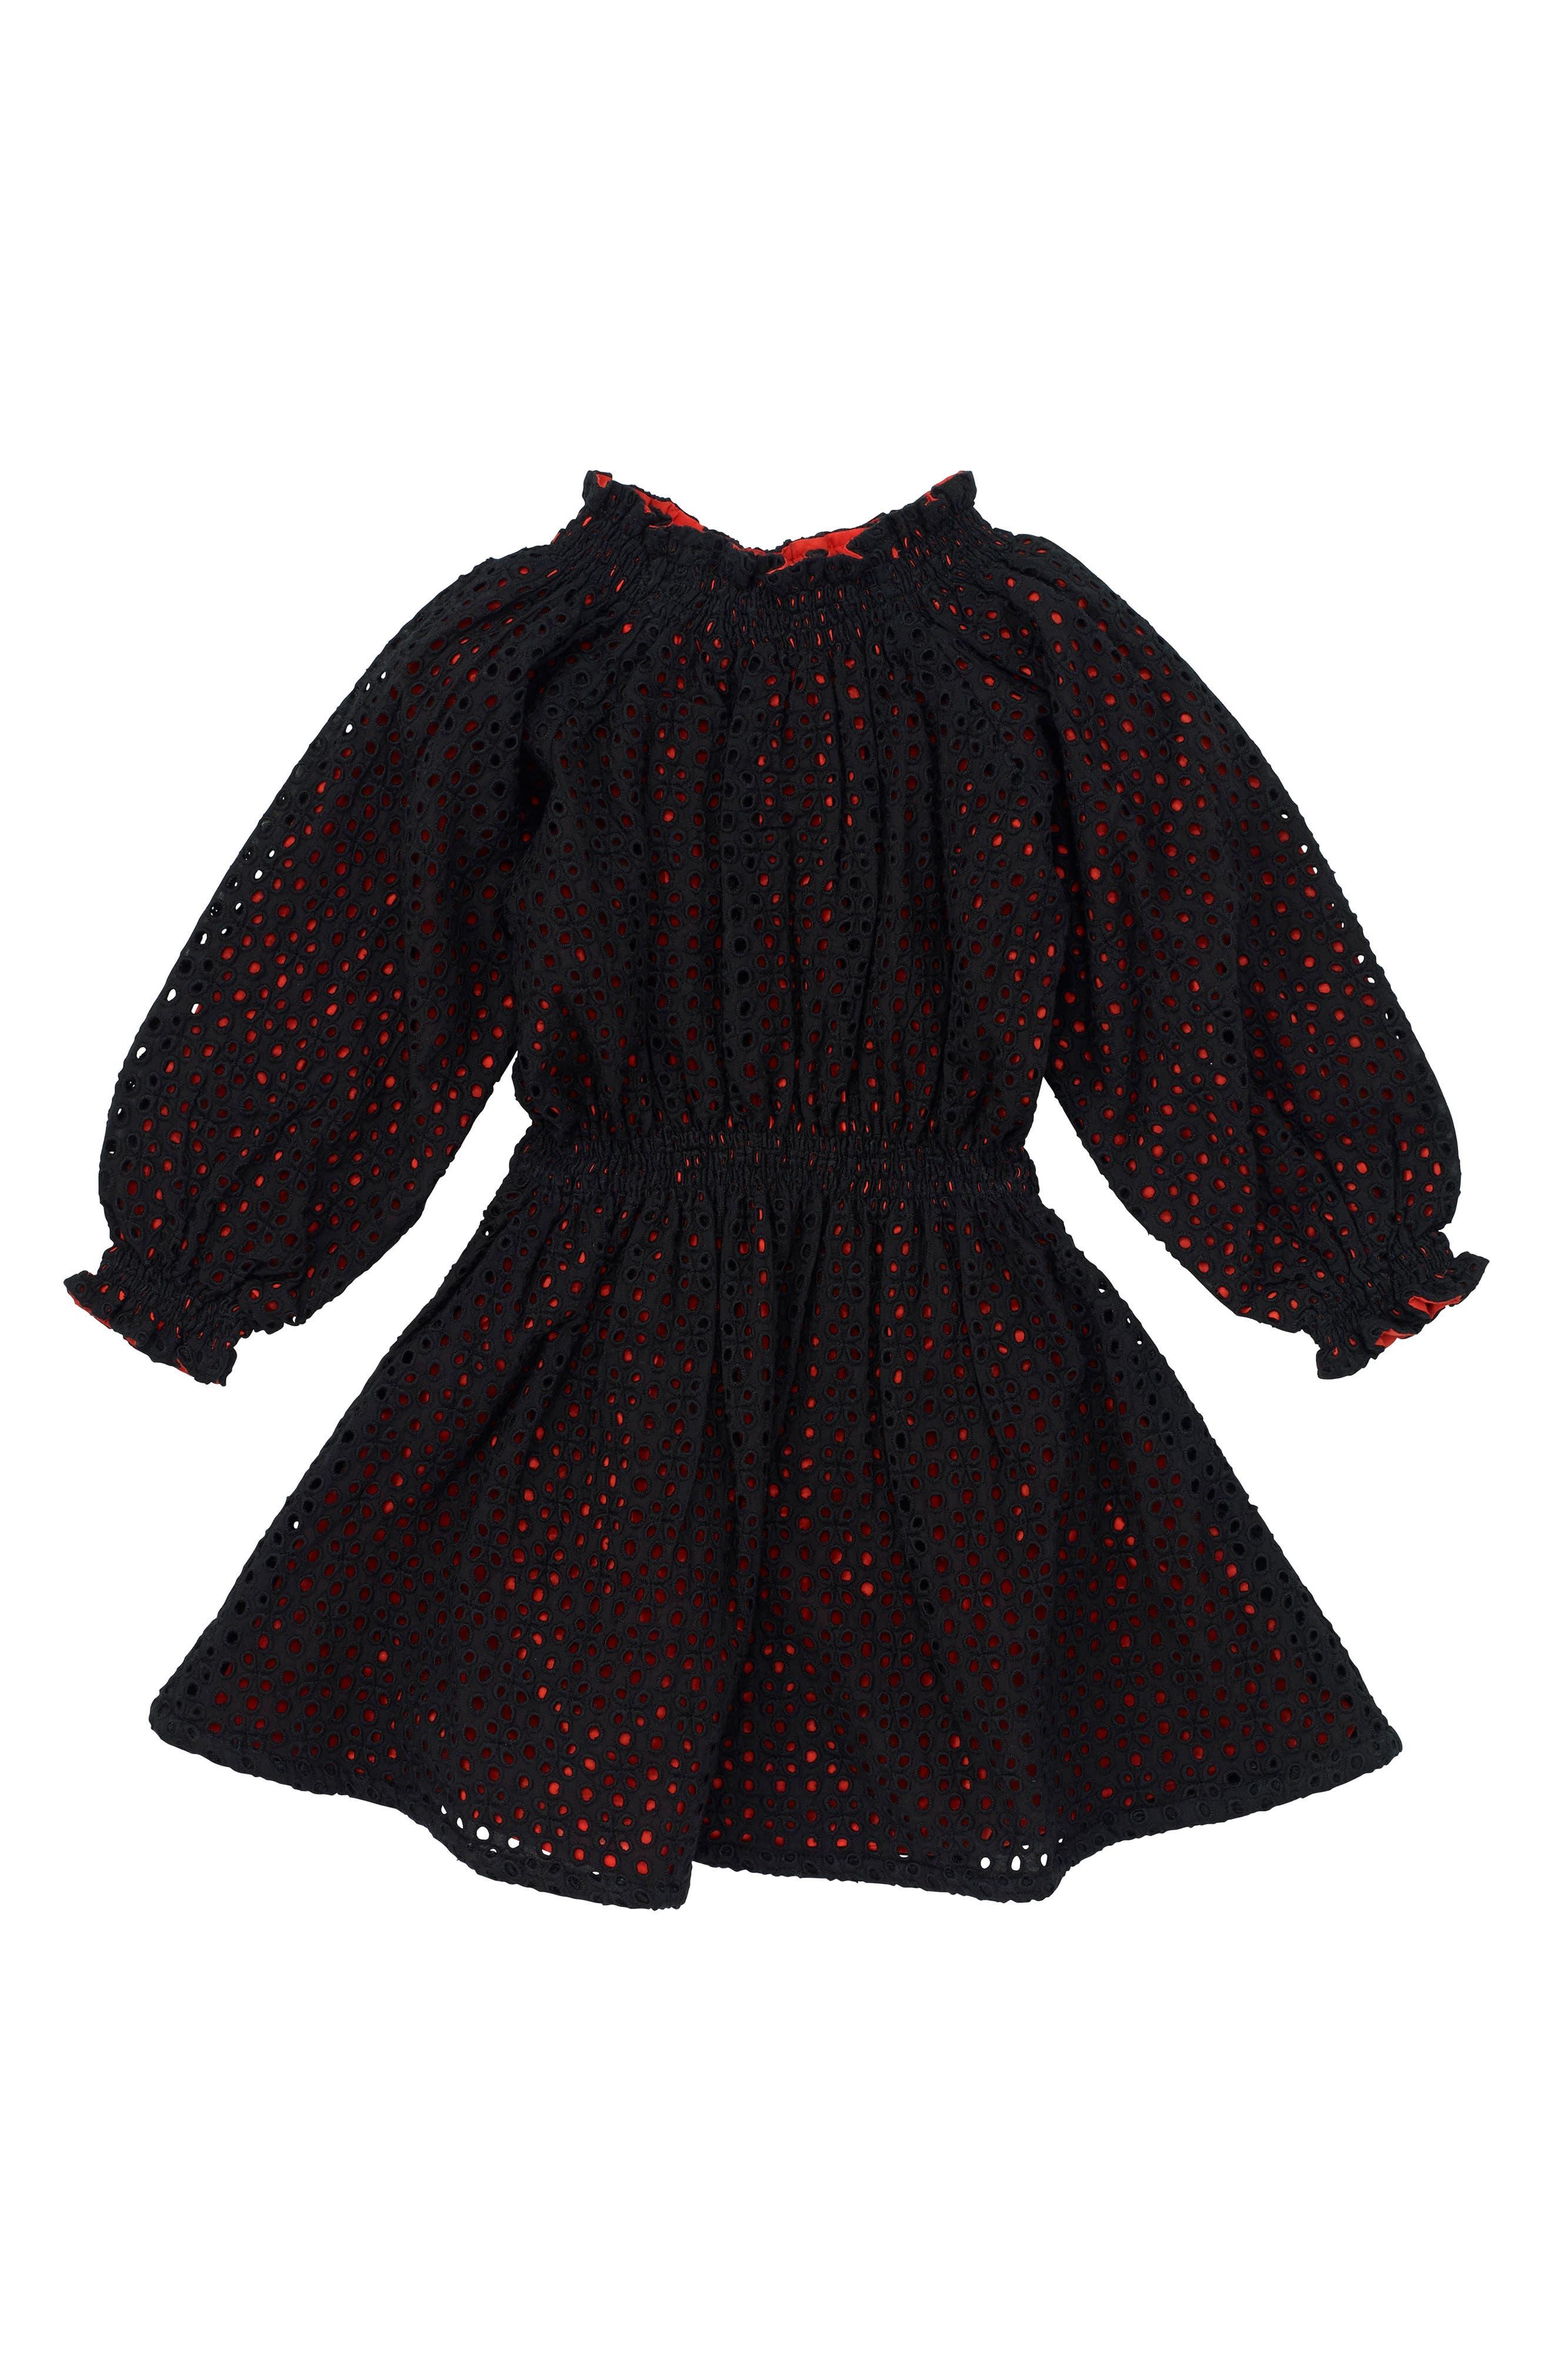 Spellbound Dress,                         Main,                         color, Black